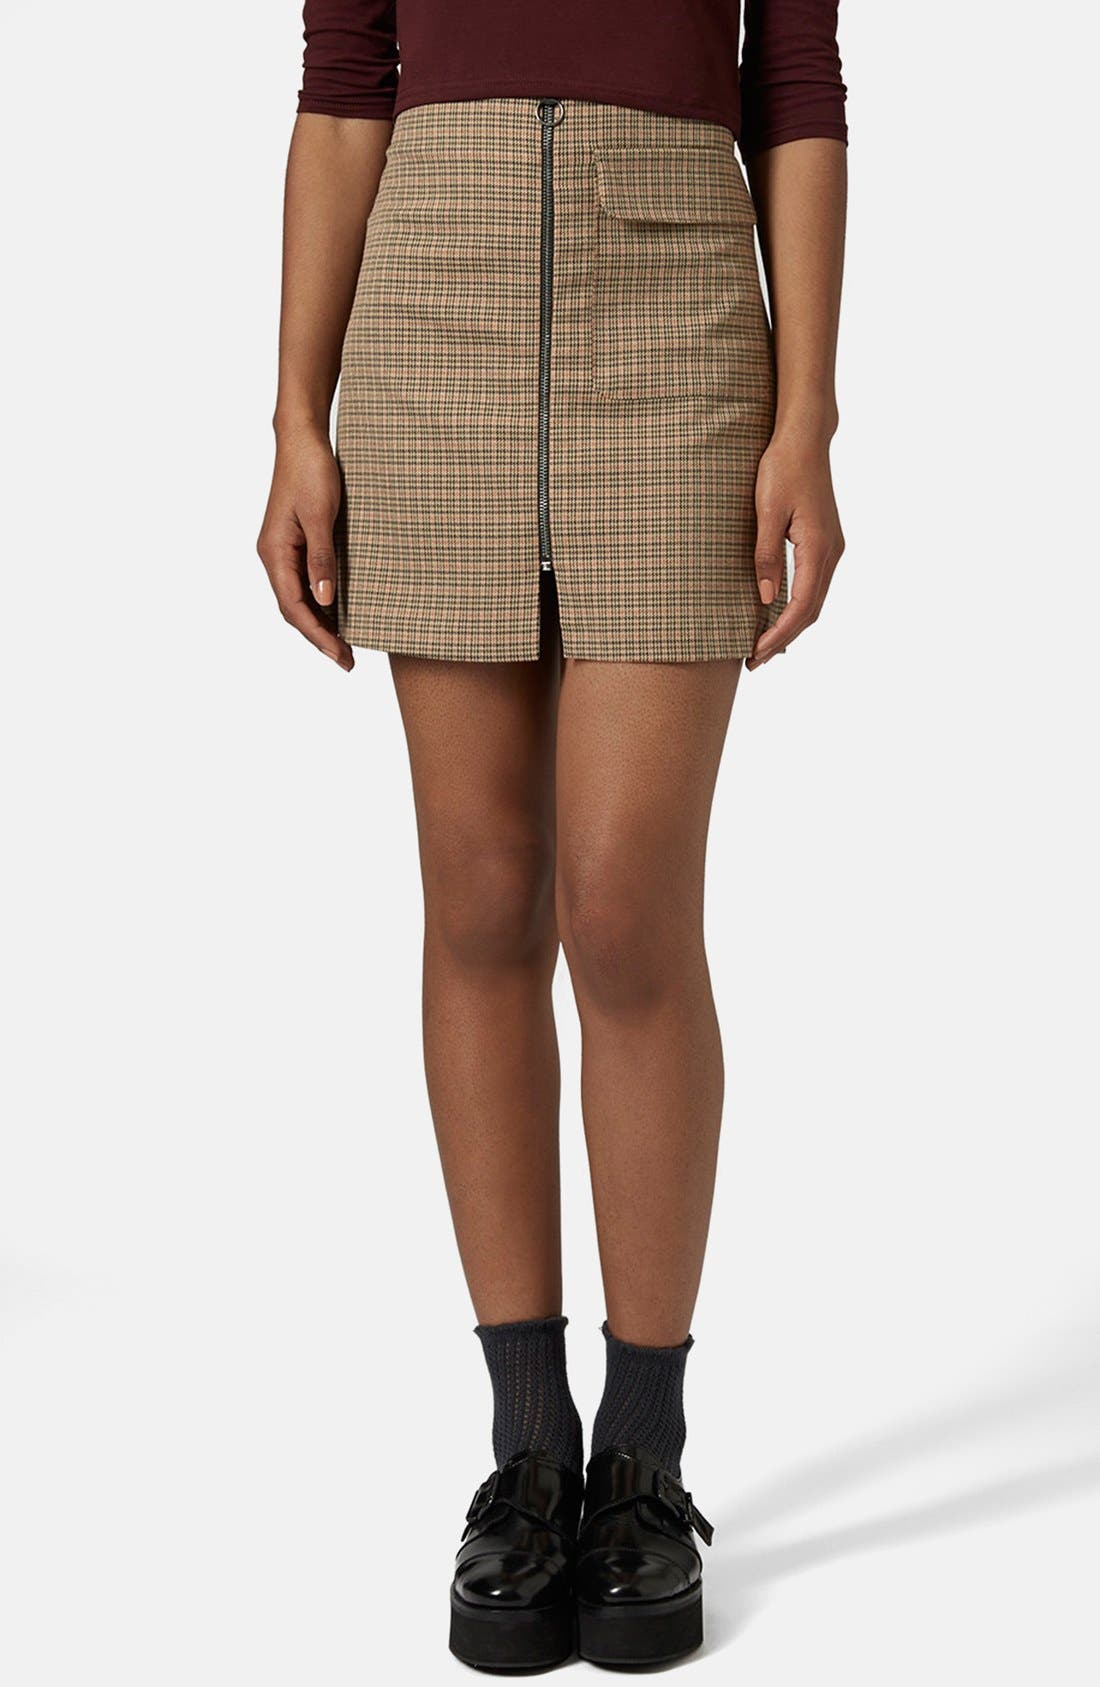 Alternate Image 1 Selected - Topshop 'Tessa' Houndstooth A-Line Miniskirt